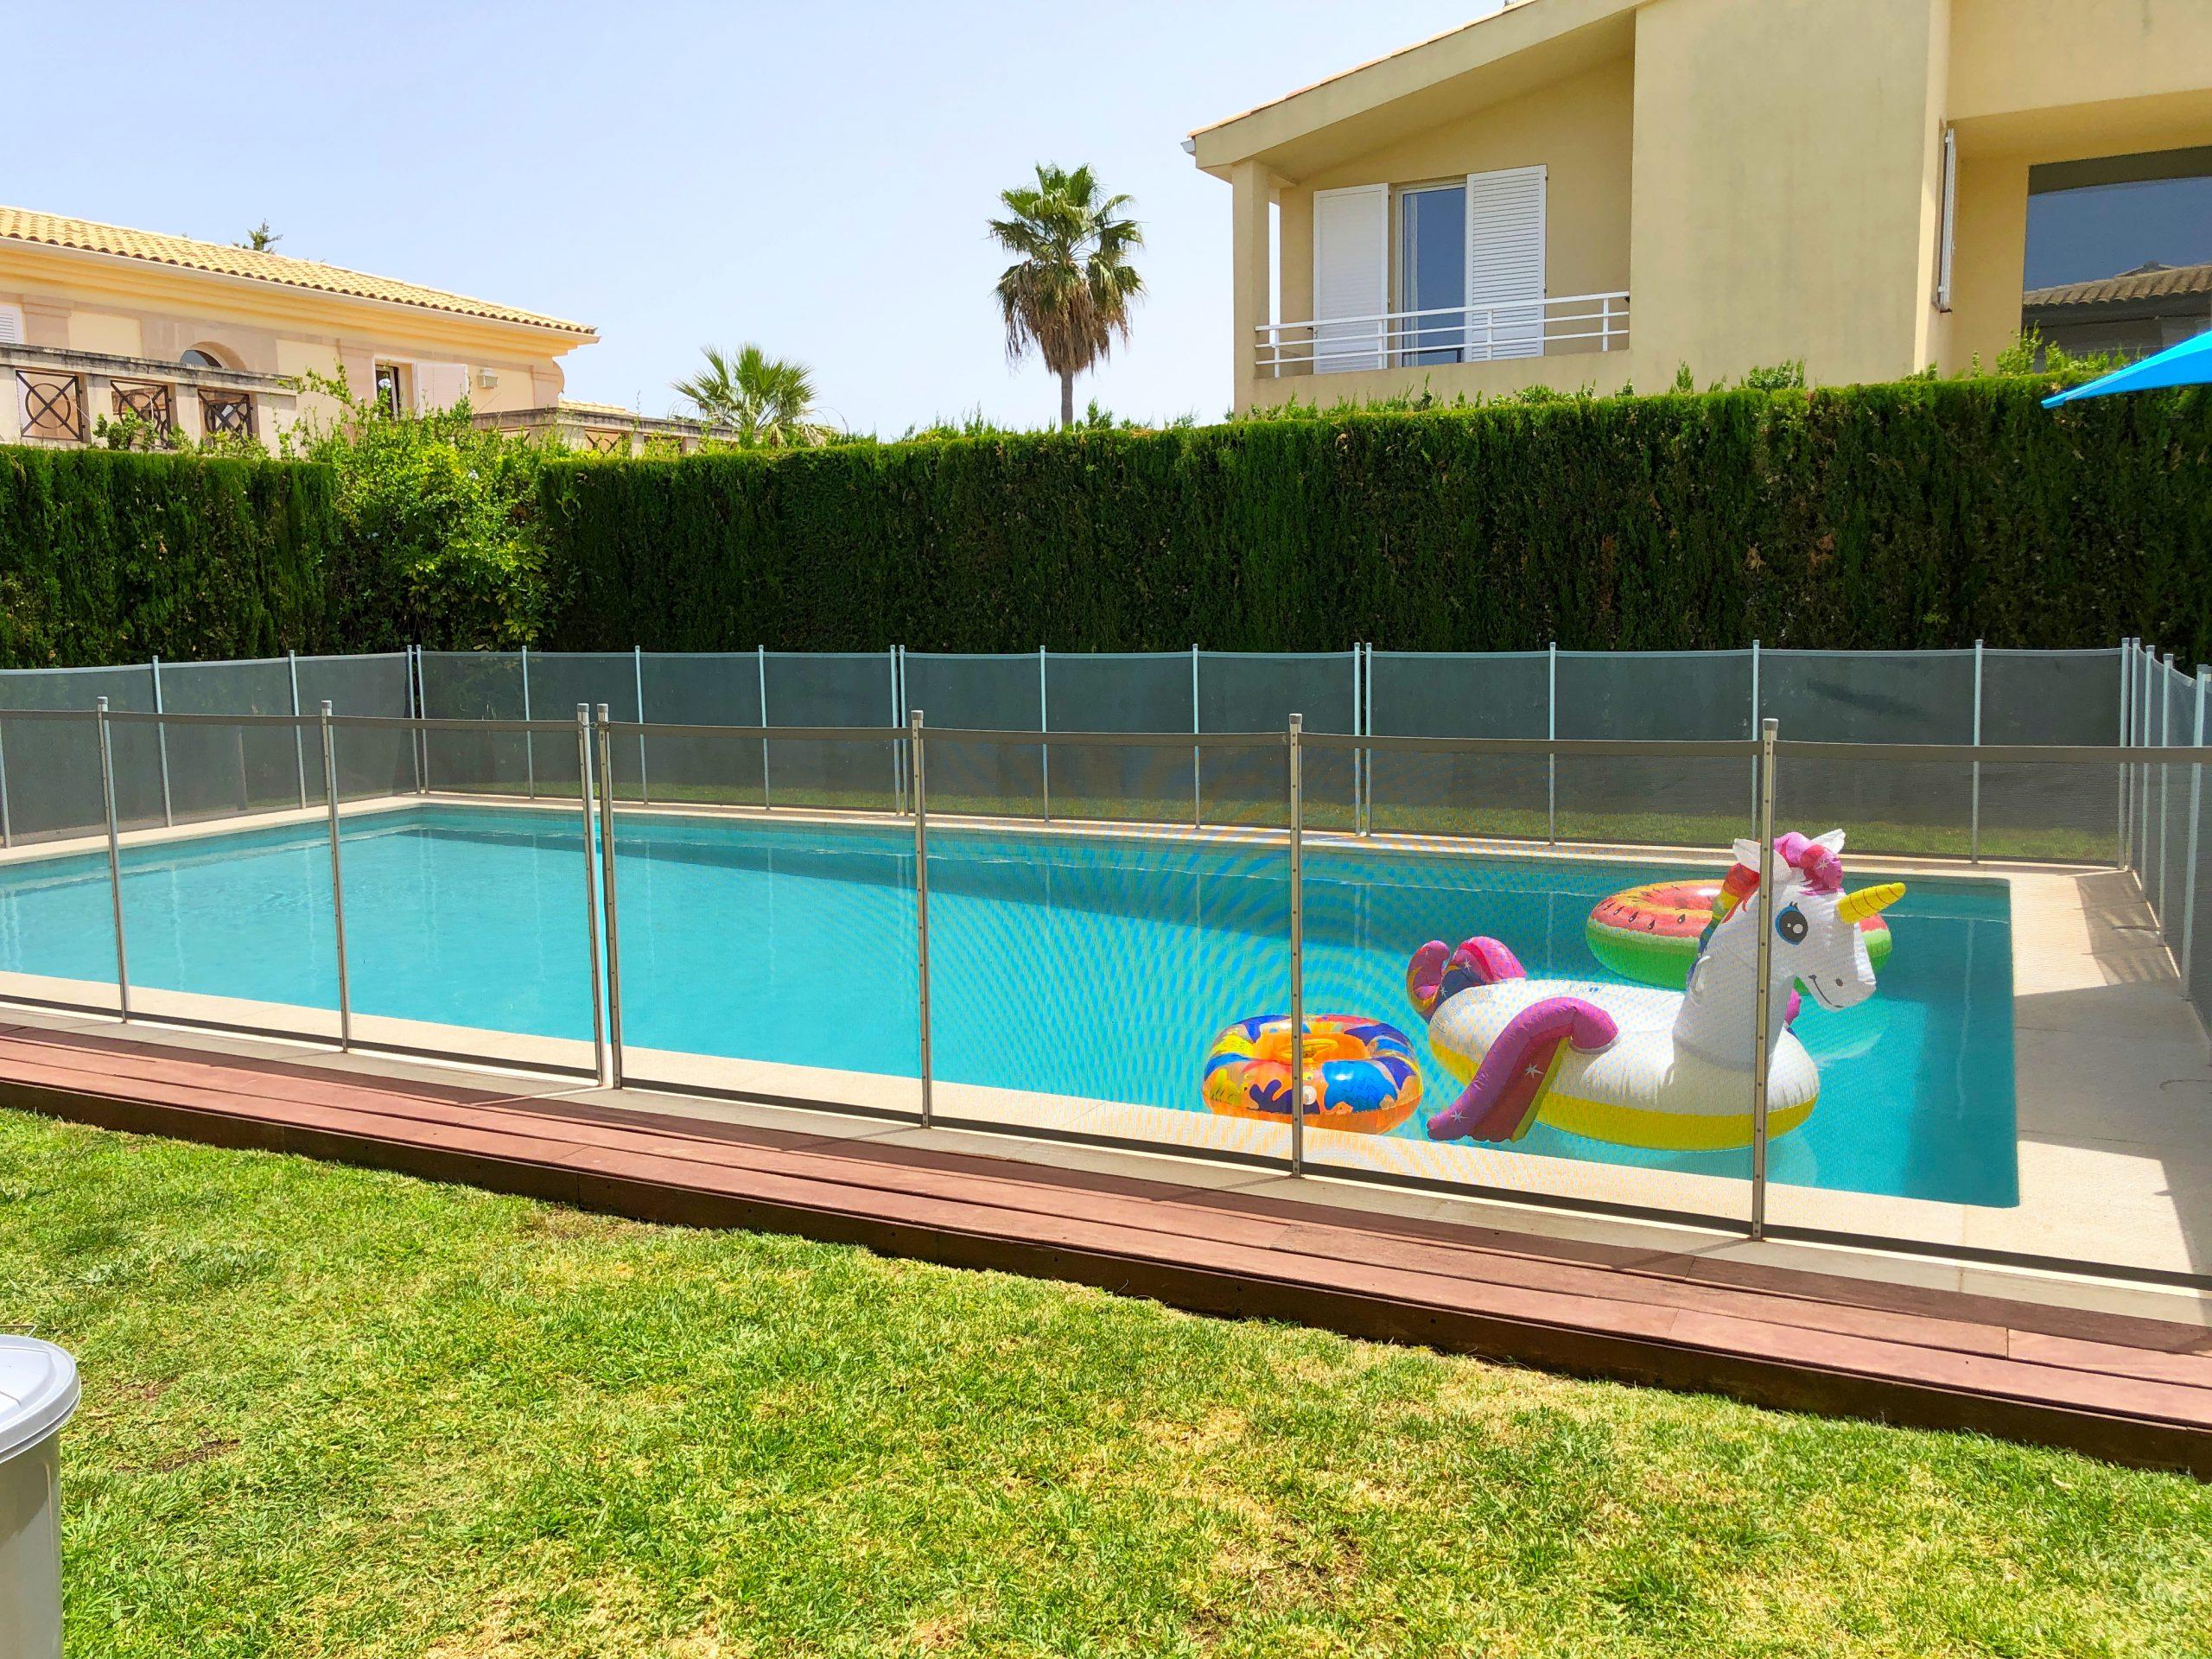 Gated pool - Villa rental in Puerto Pollensa